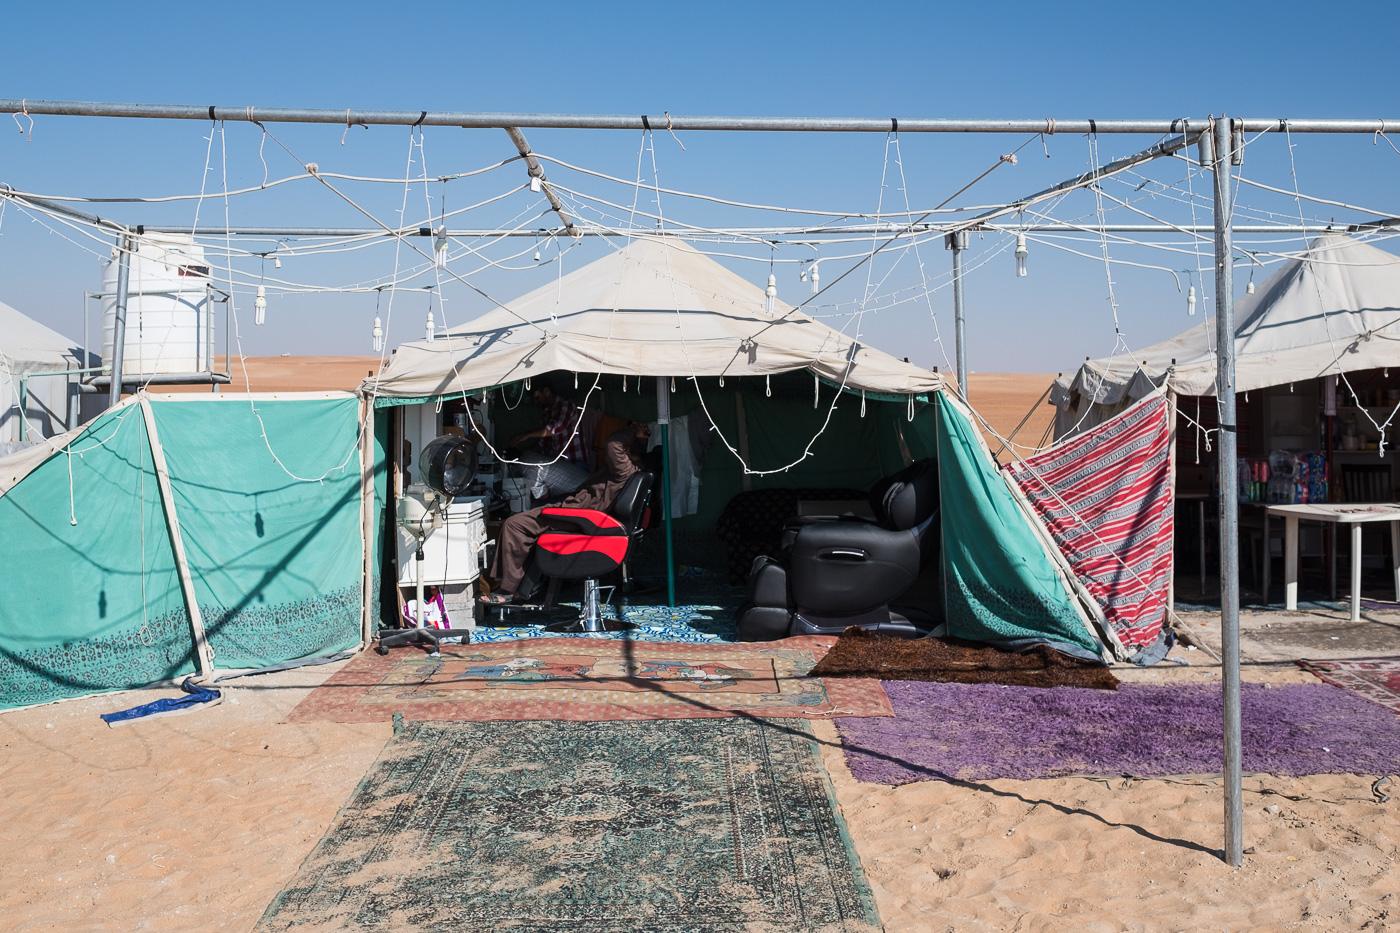 The Camel Festival shops #2